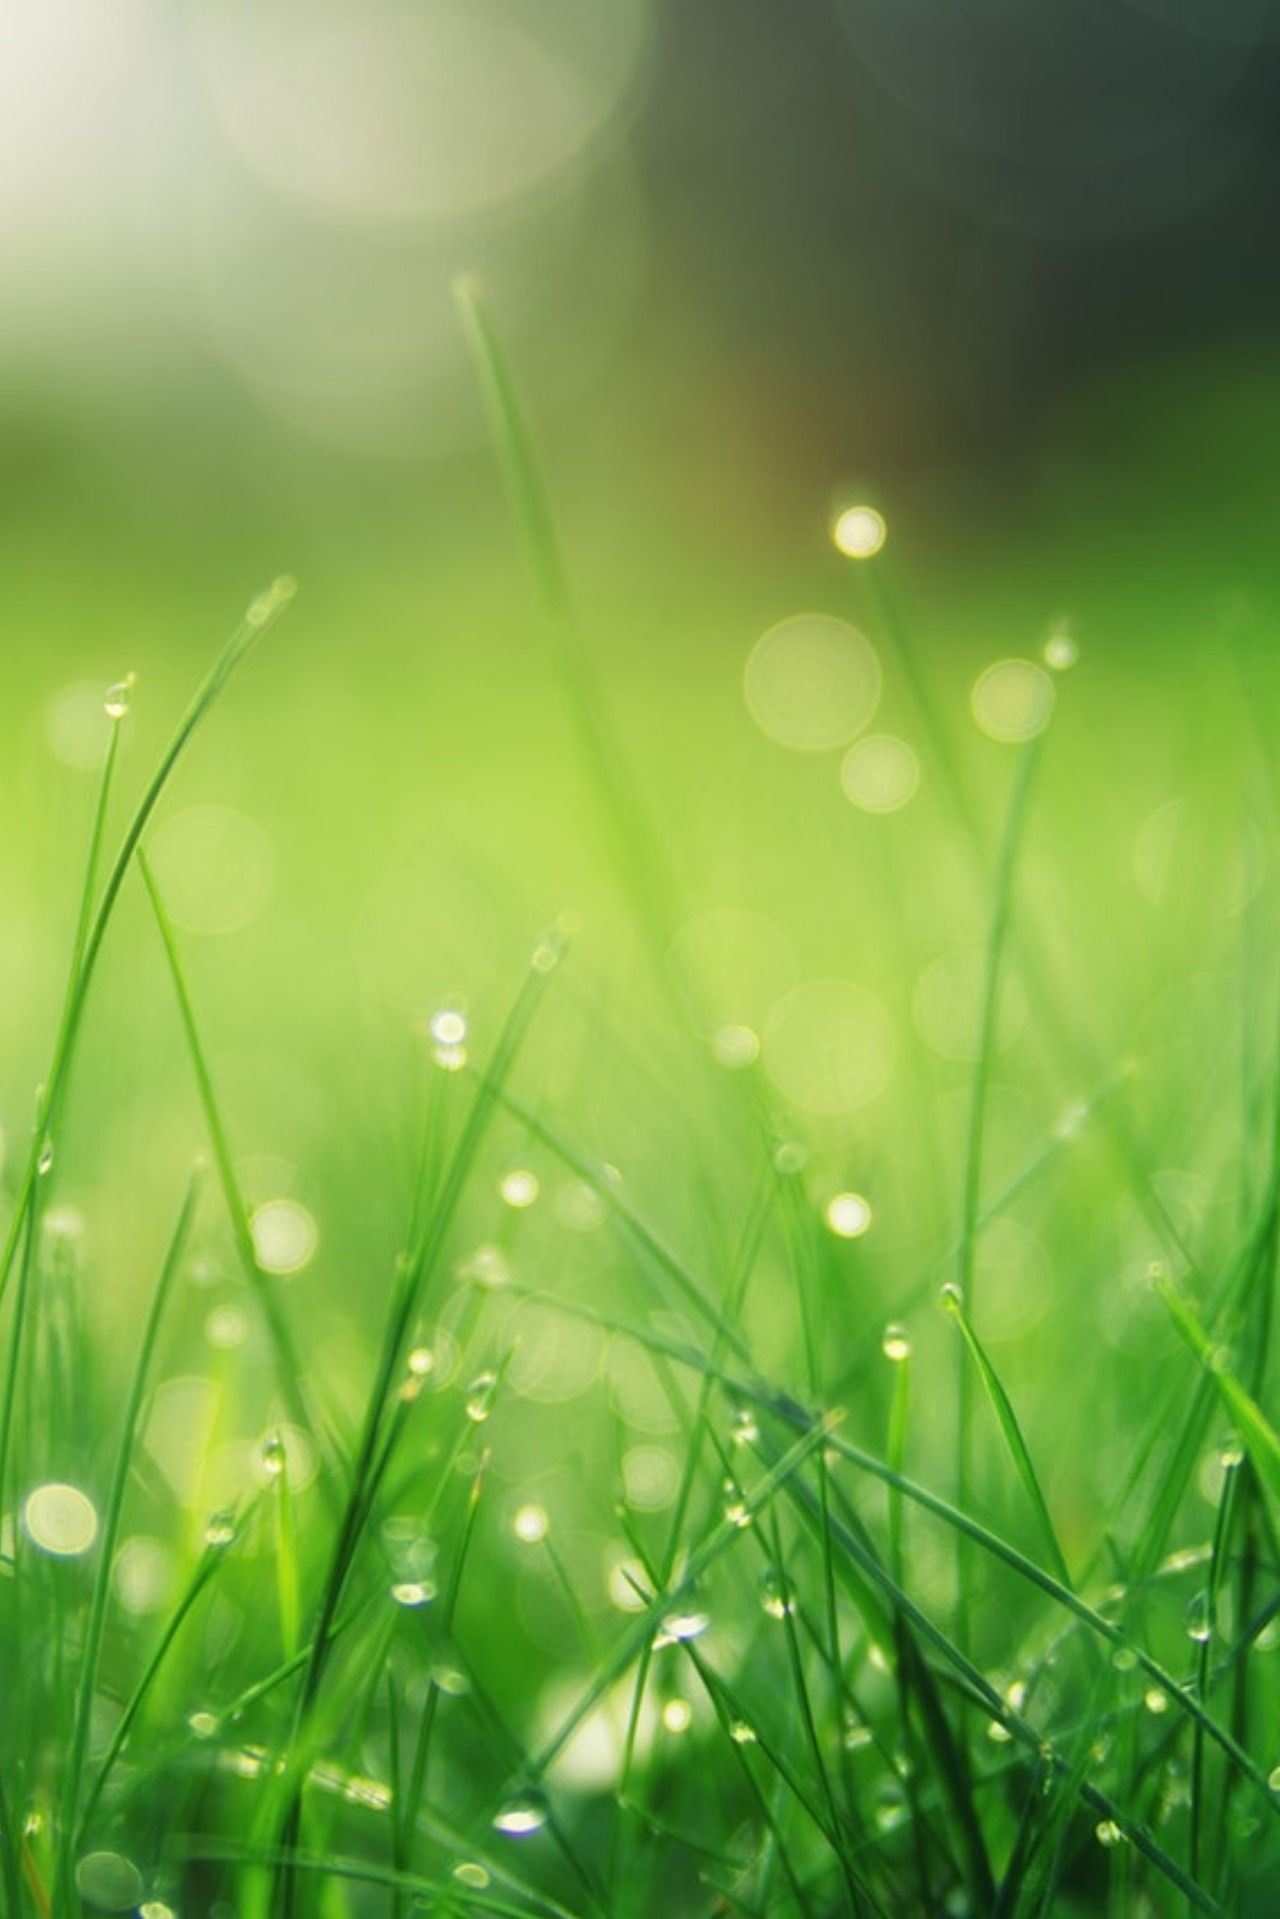 Should You Trust The Official Racecourse Going Description Grass Wallpaper Green Nature